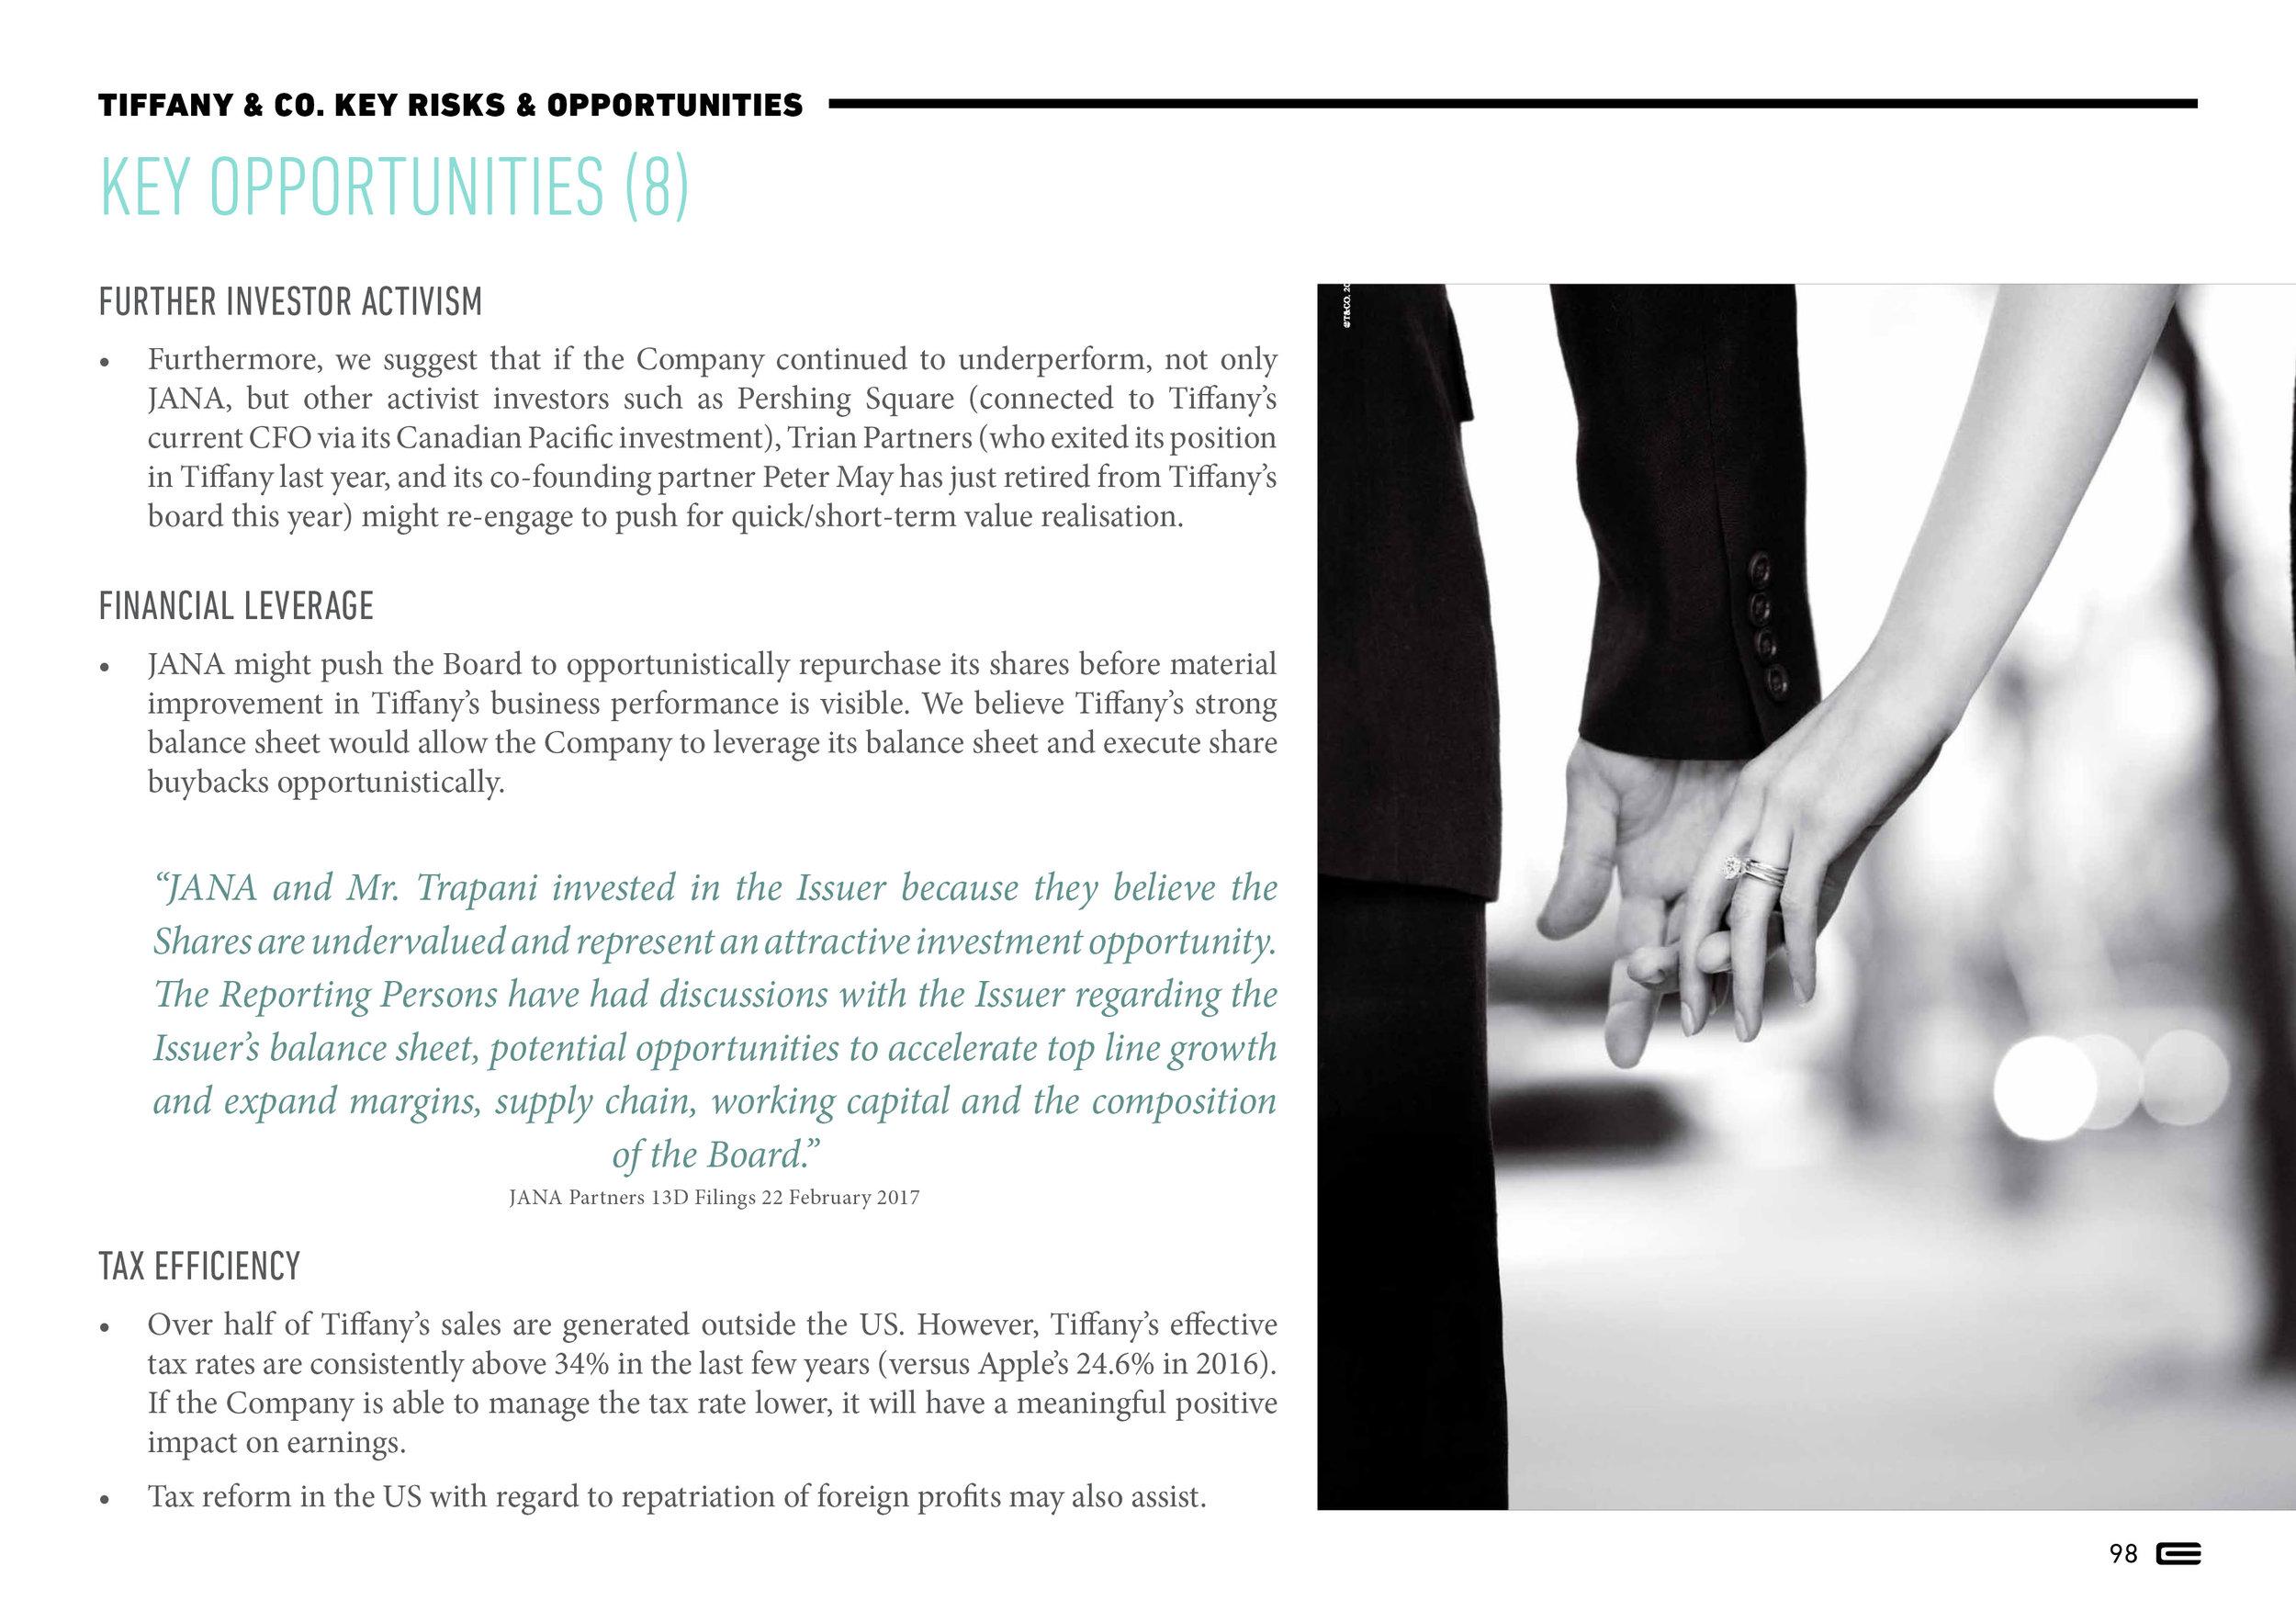 EC - VIC 2018 Presentation on Tiffany98.jpg